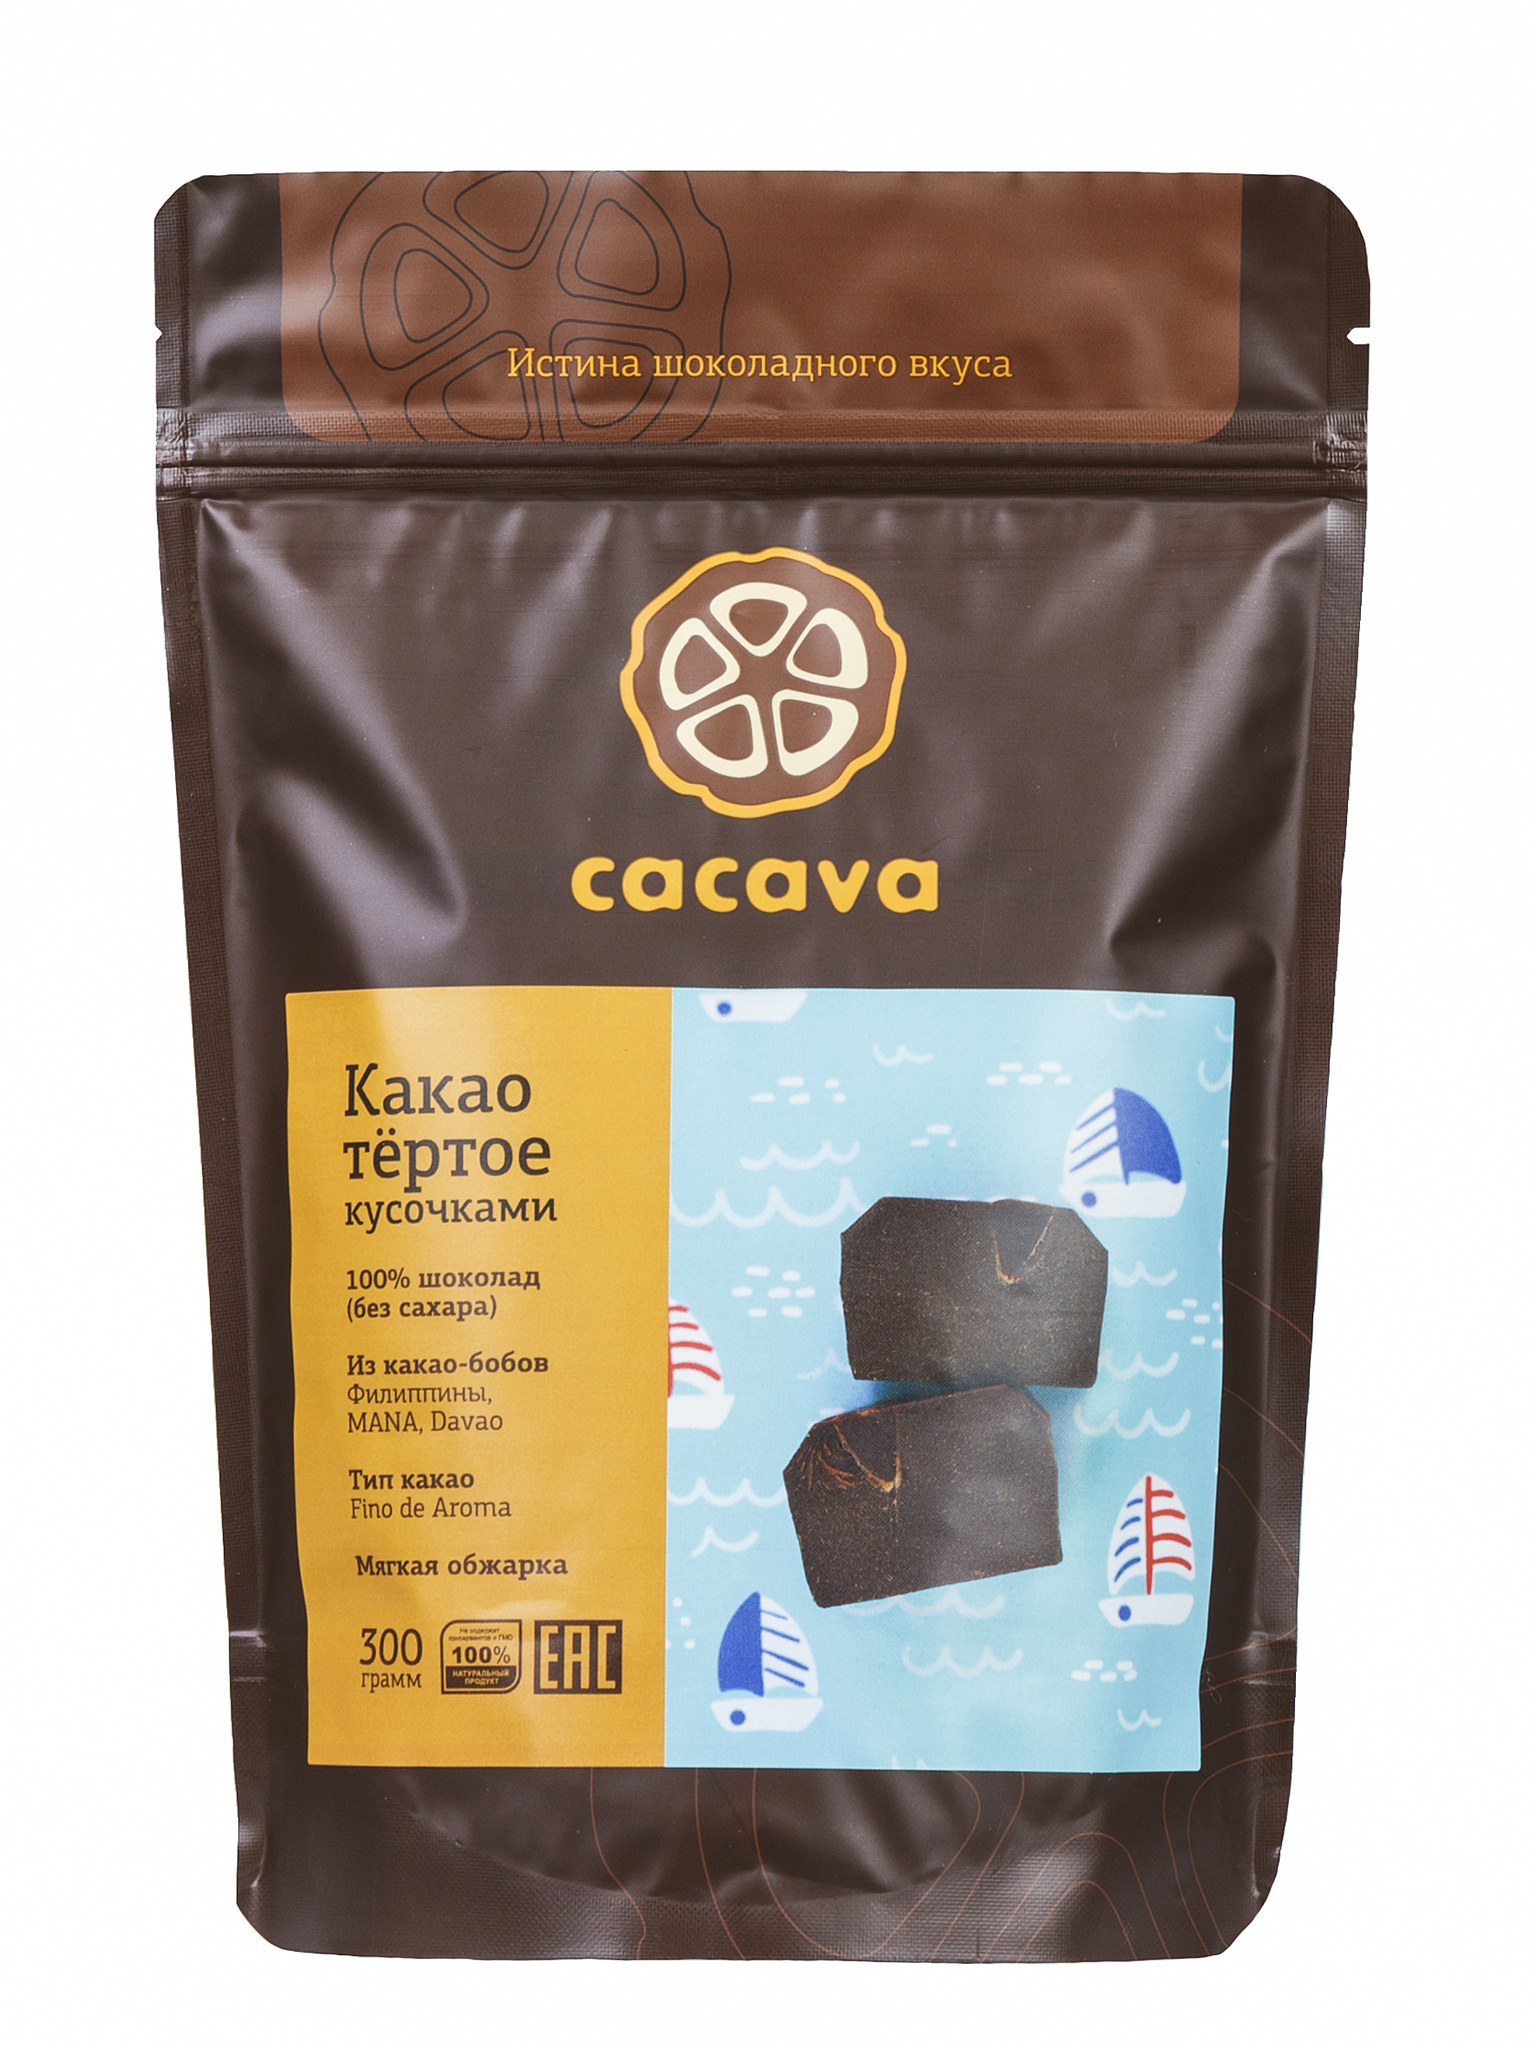 Какао тёртое кусочками (Филиппины, MANA, Davao), упаковка 300 грамм